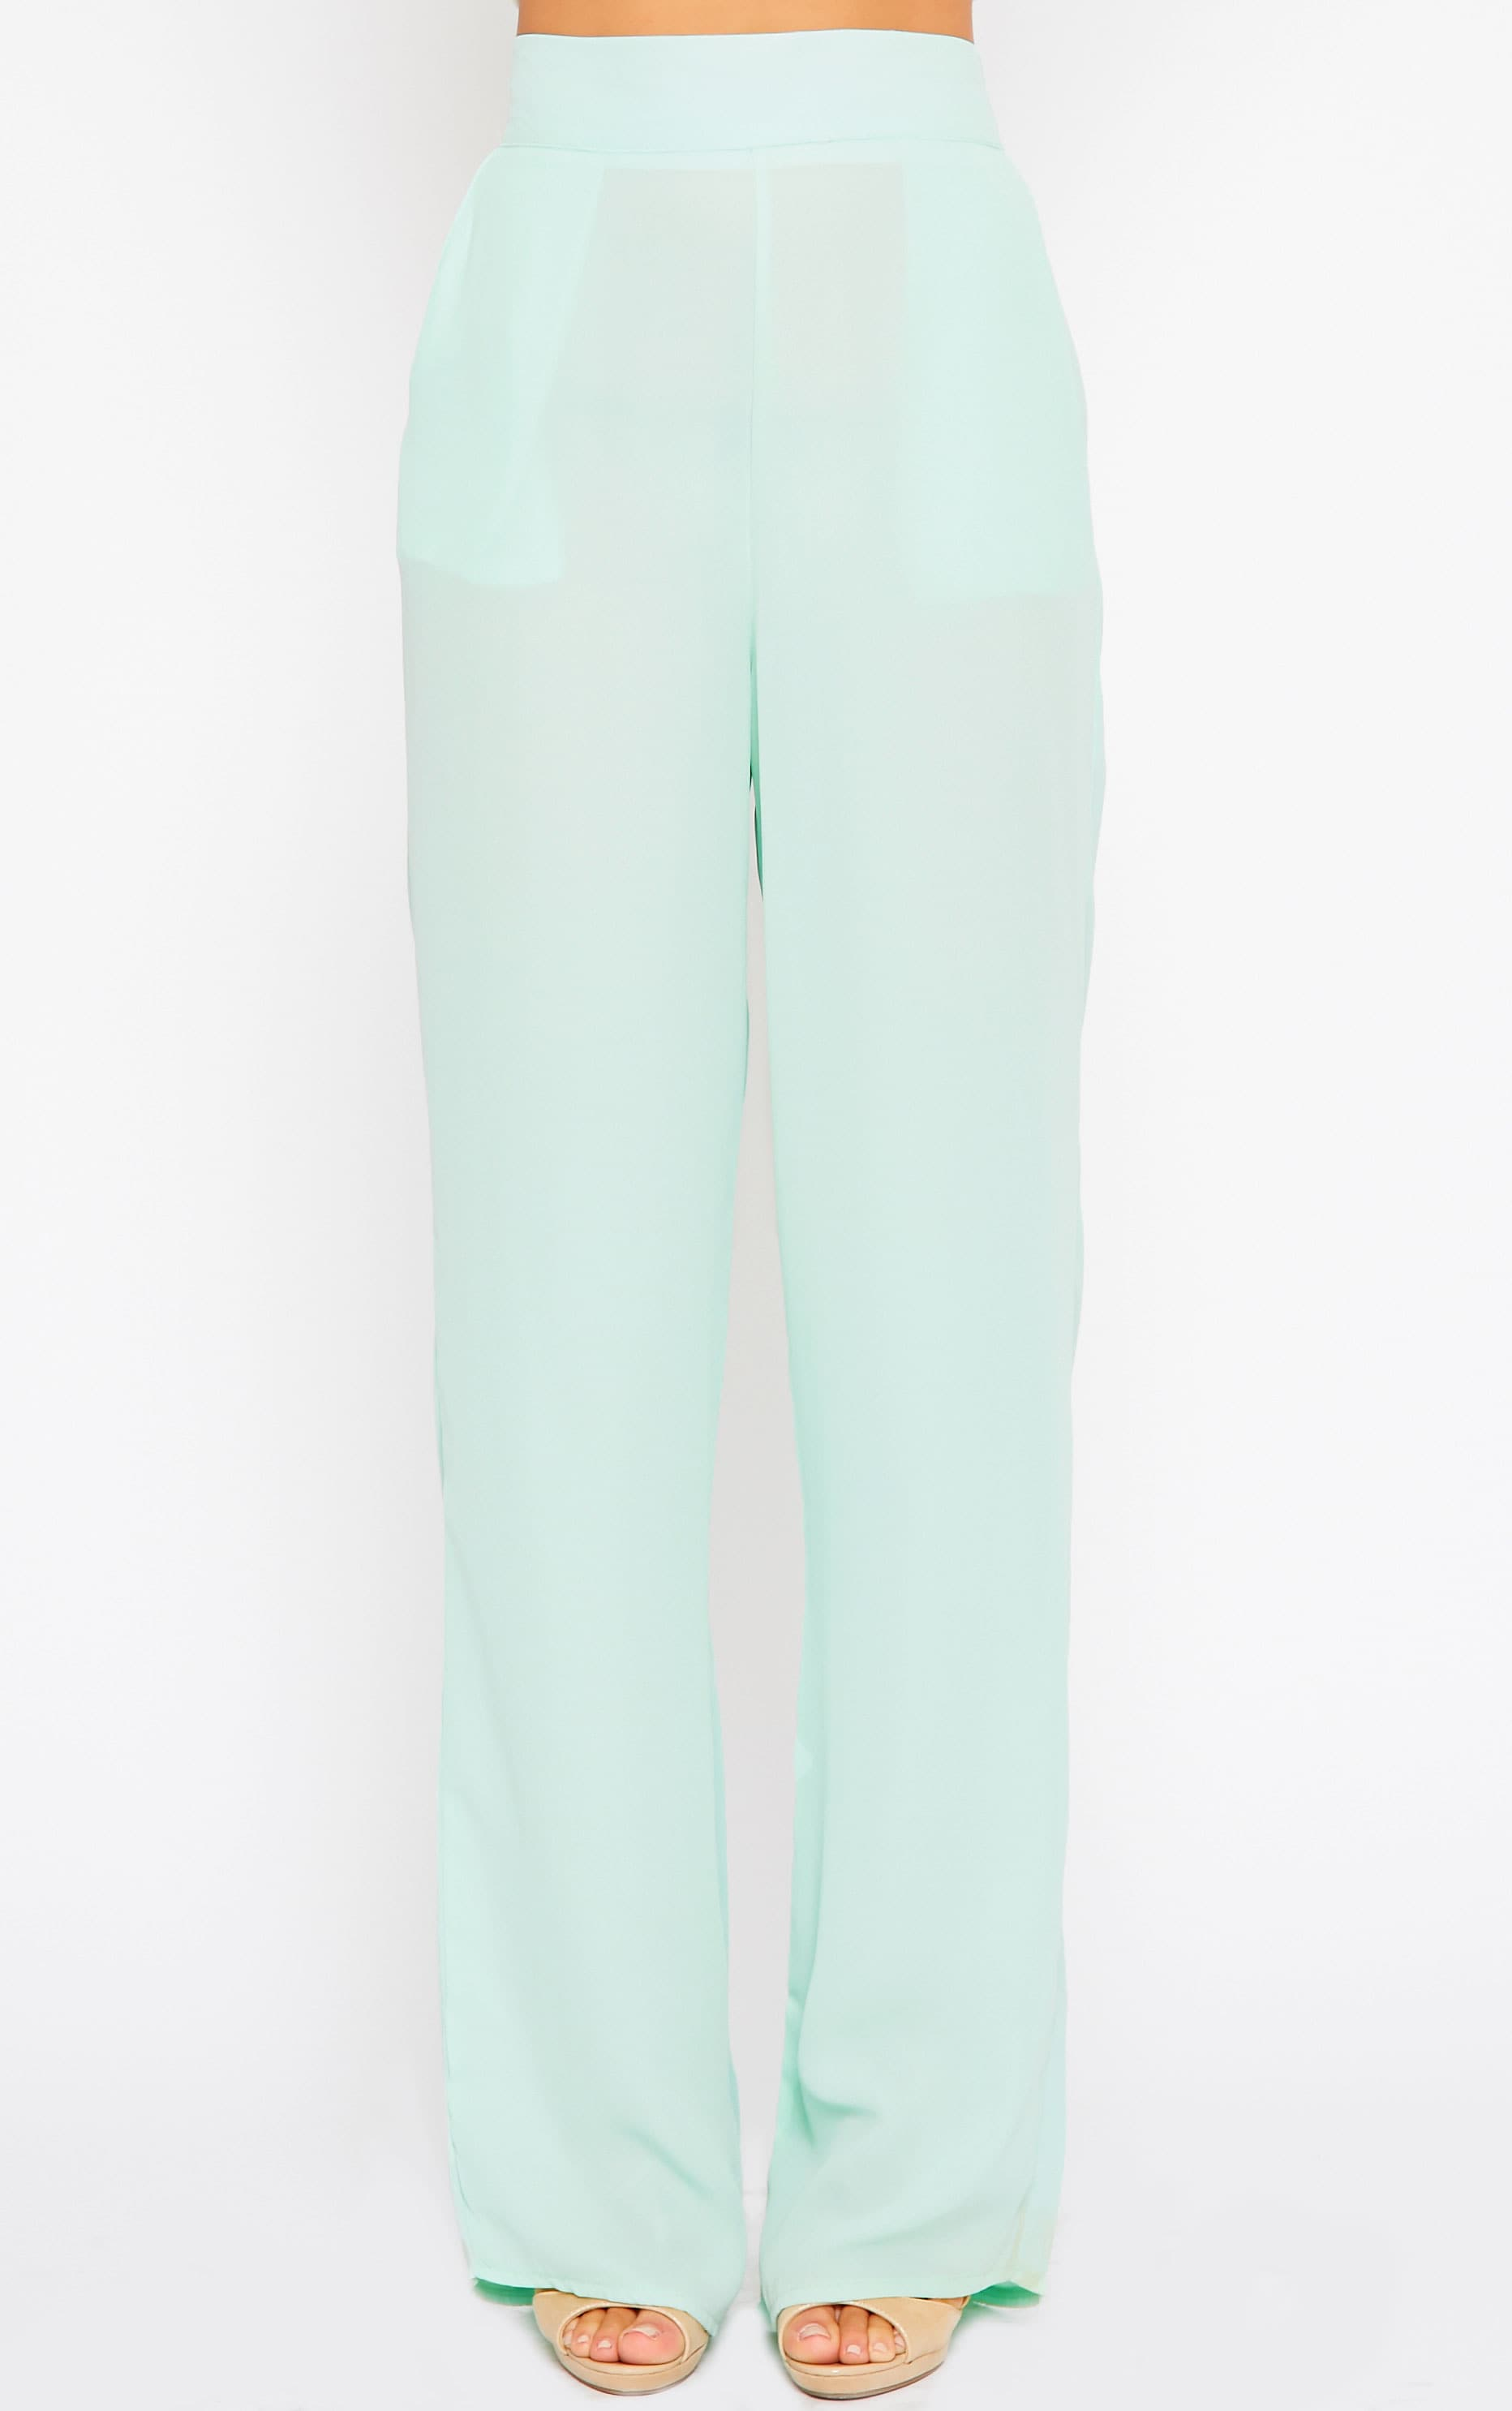 Theadora Mint Chiffon Wide Leg Trousers 2